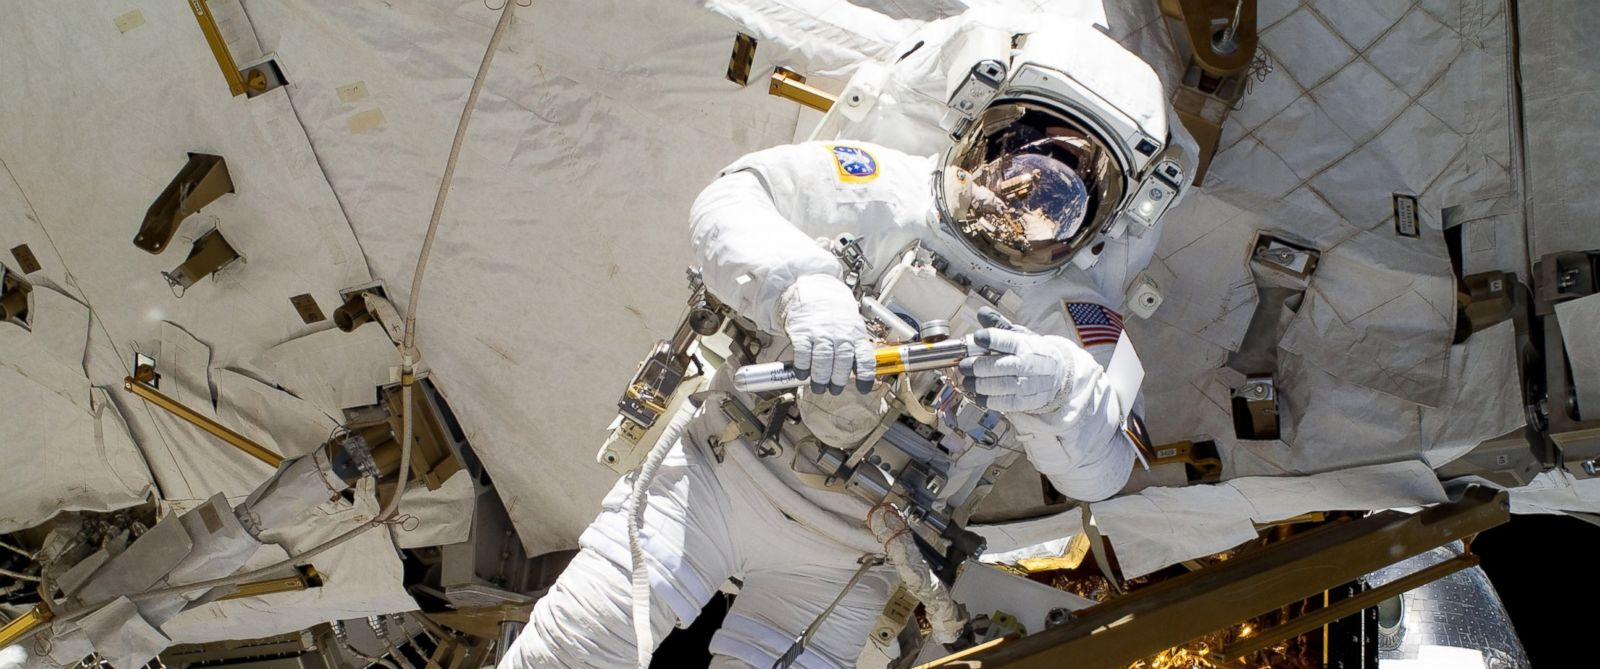 space race nasa companies - photo #17